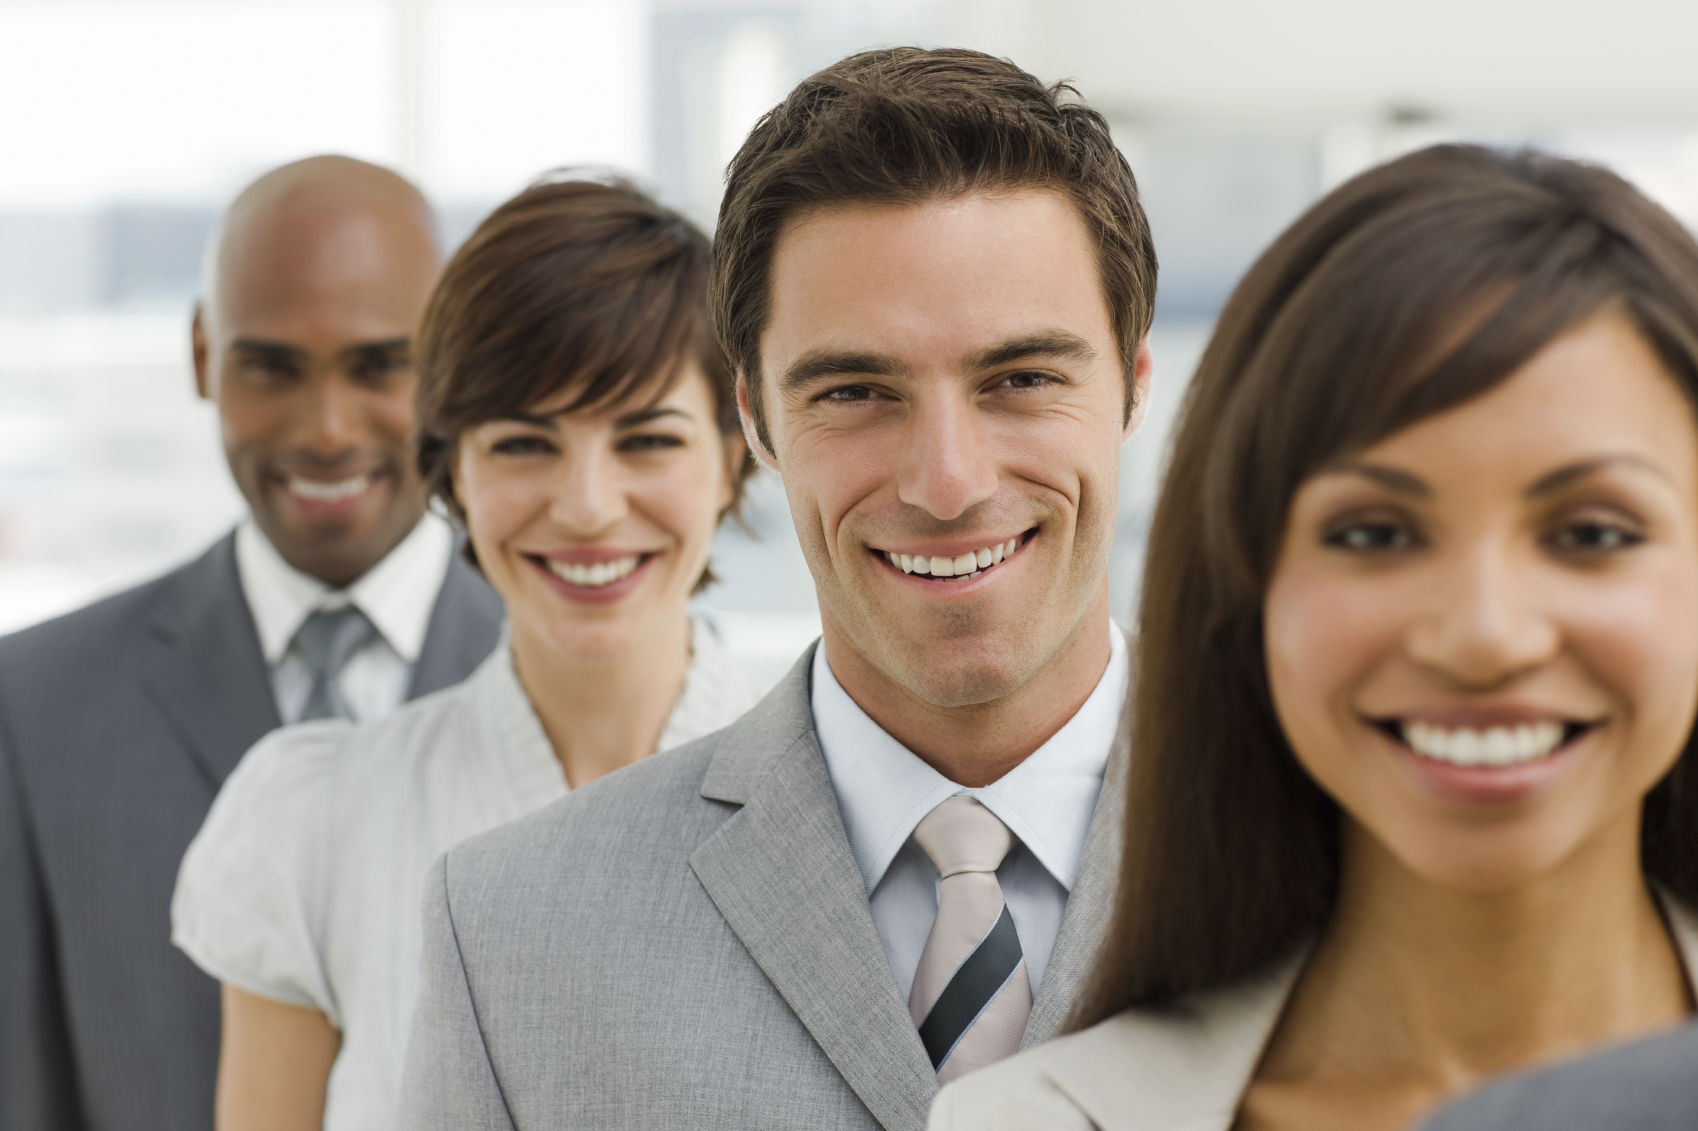 We help companies to update their employee wellness program